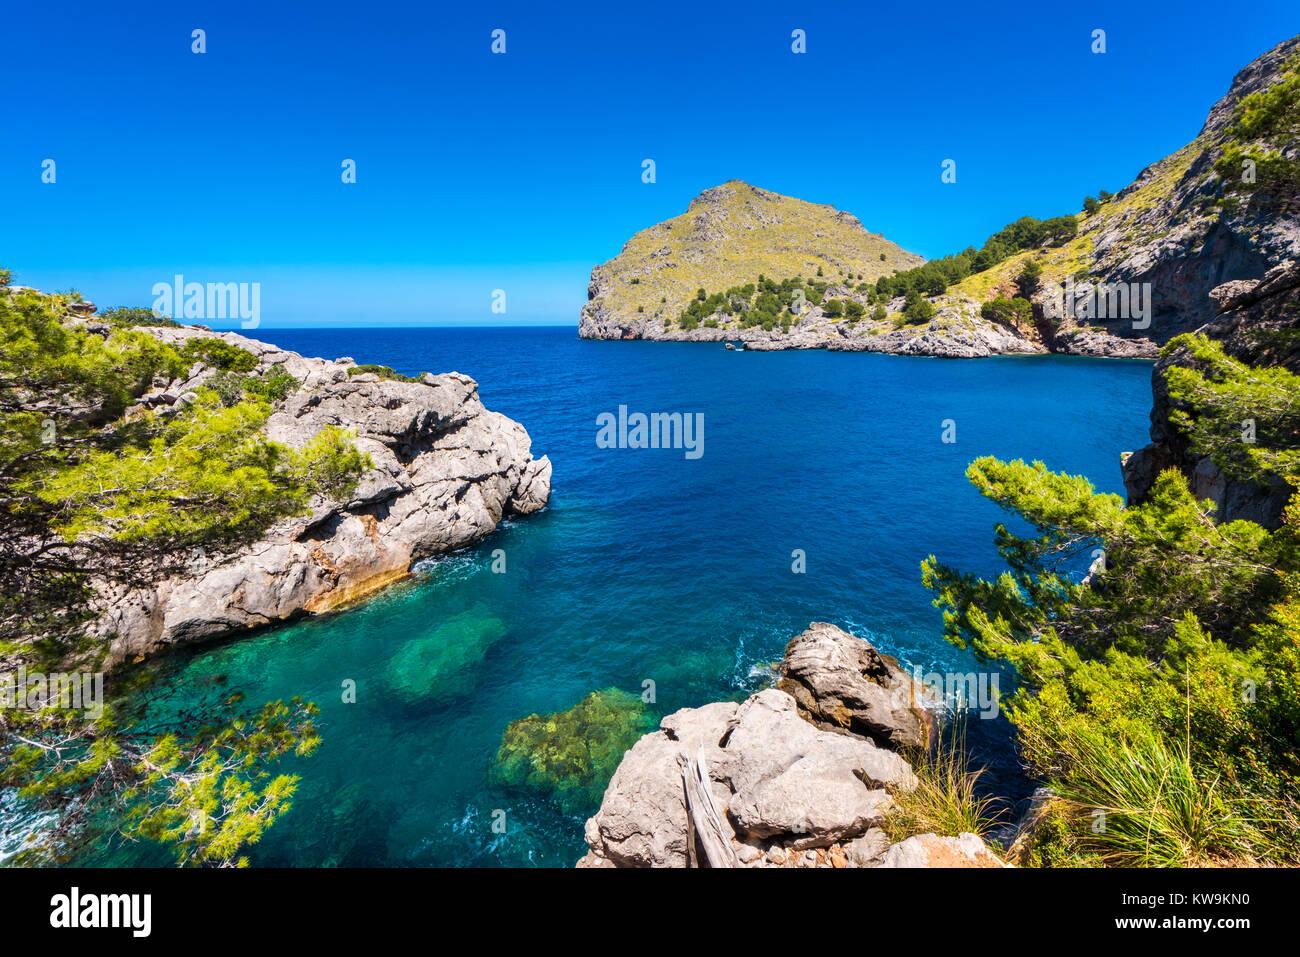 Coastline of Port de Sa Calobra Mallorca Spain - Stock Image